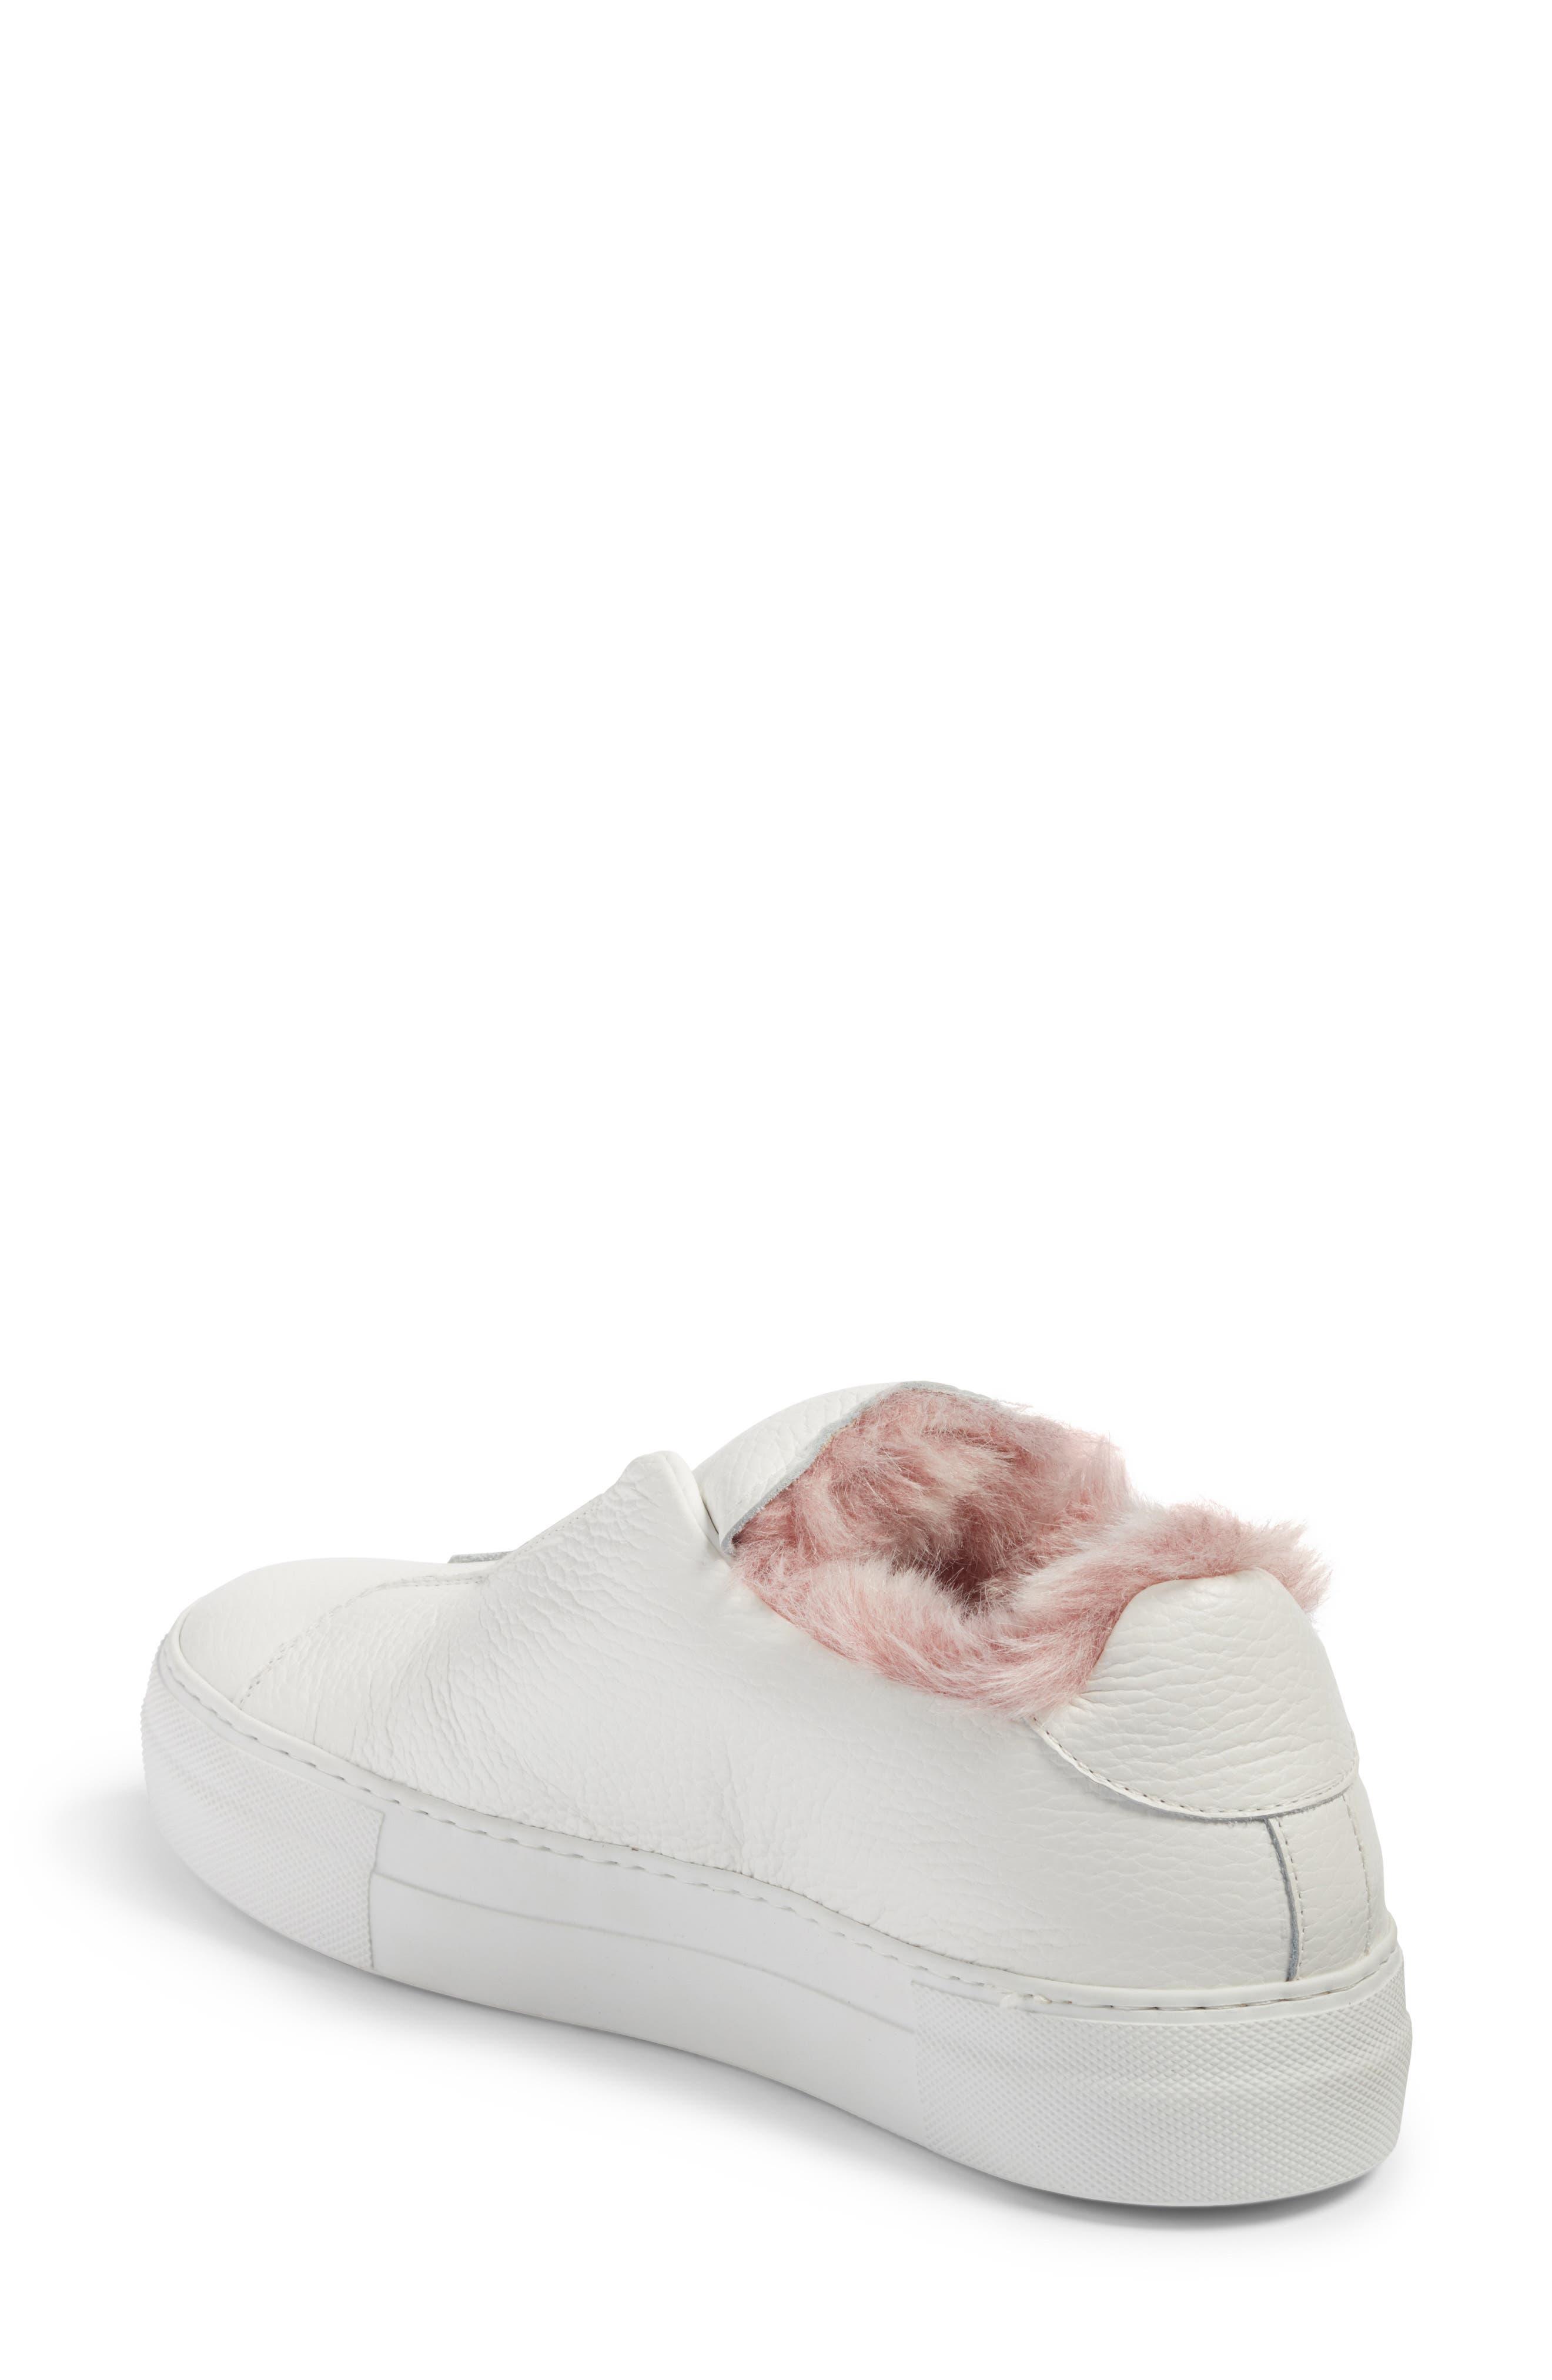 Faux Fur Slip-On Sneaker,                             Alternate thumbnail 4, color,